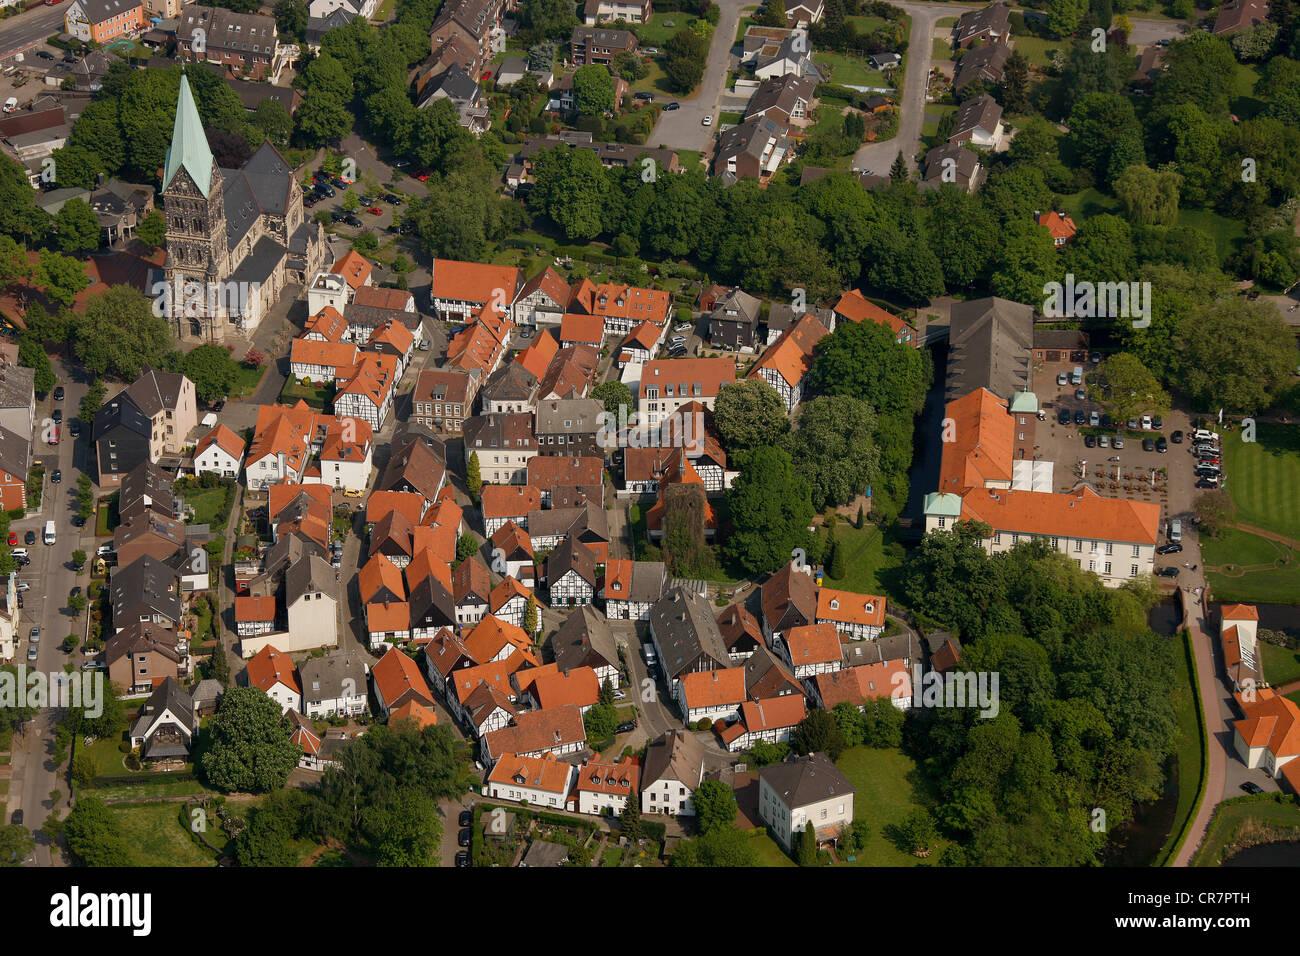 Aerial view, Altes Dorf quarter, Westerholt, Herten, Ruhrgebiet region, North Rhine-Westphalia, Germany, Europe - Stock Image